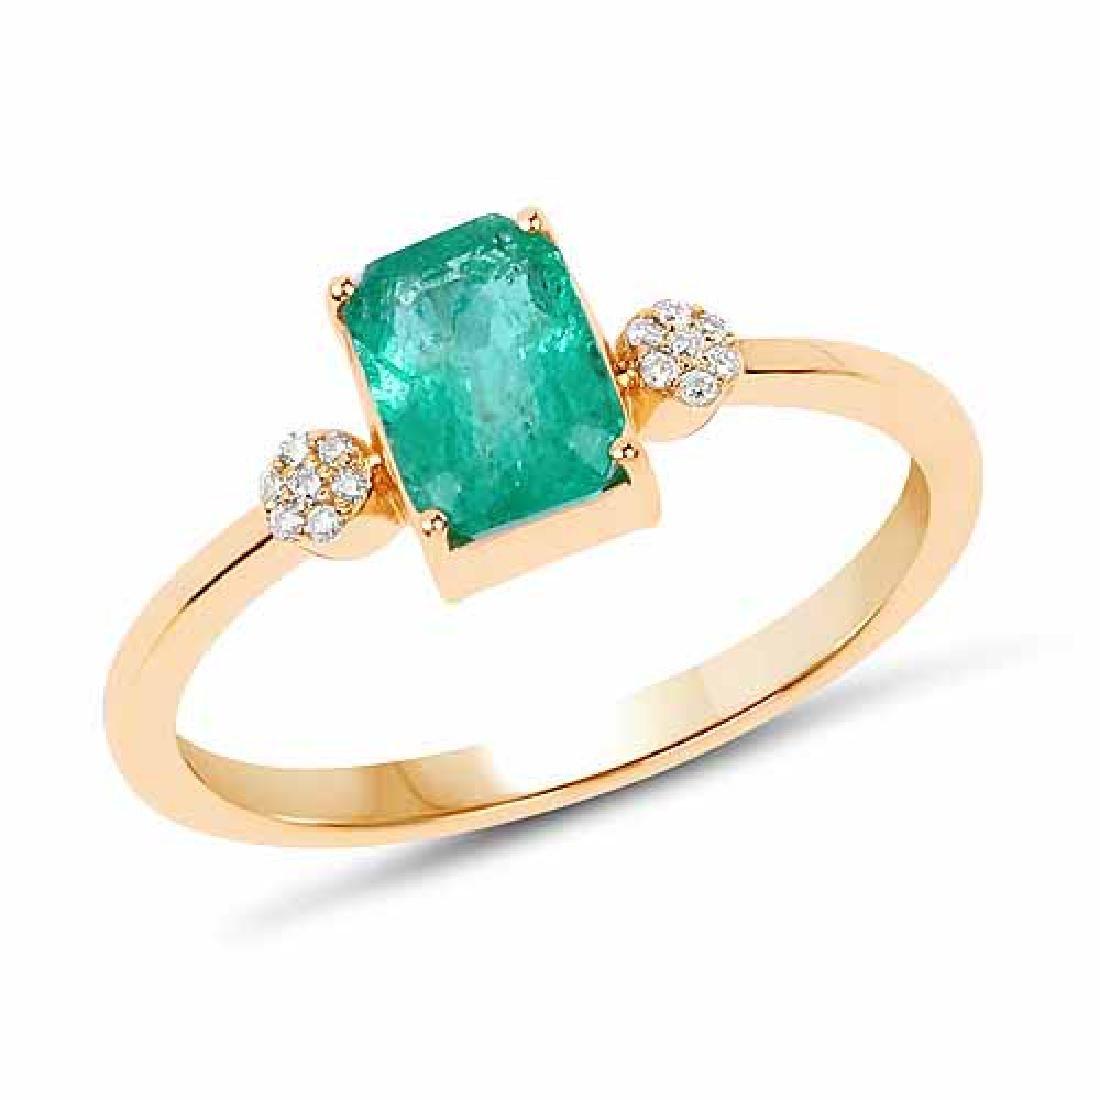 0.97 Carat Genuine Zambian Emerald and White Diamond 14